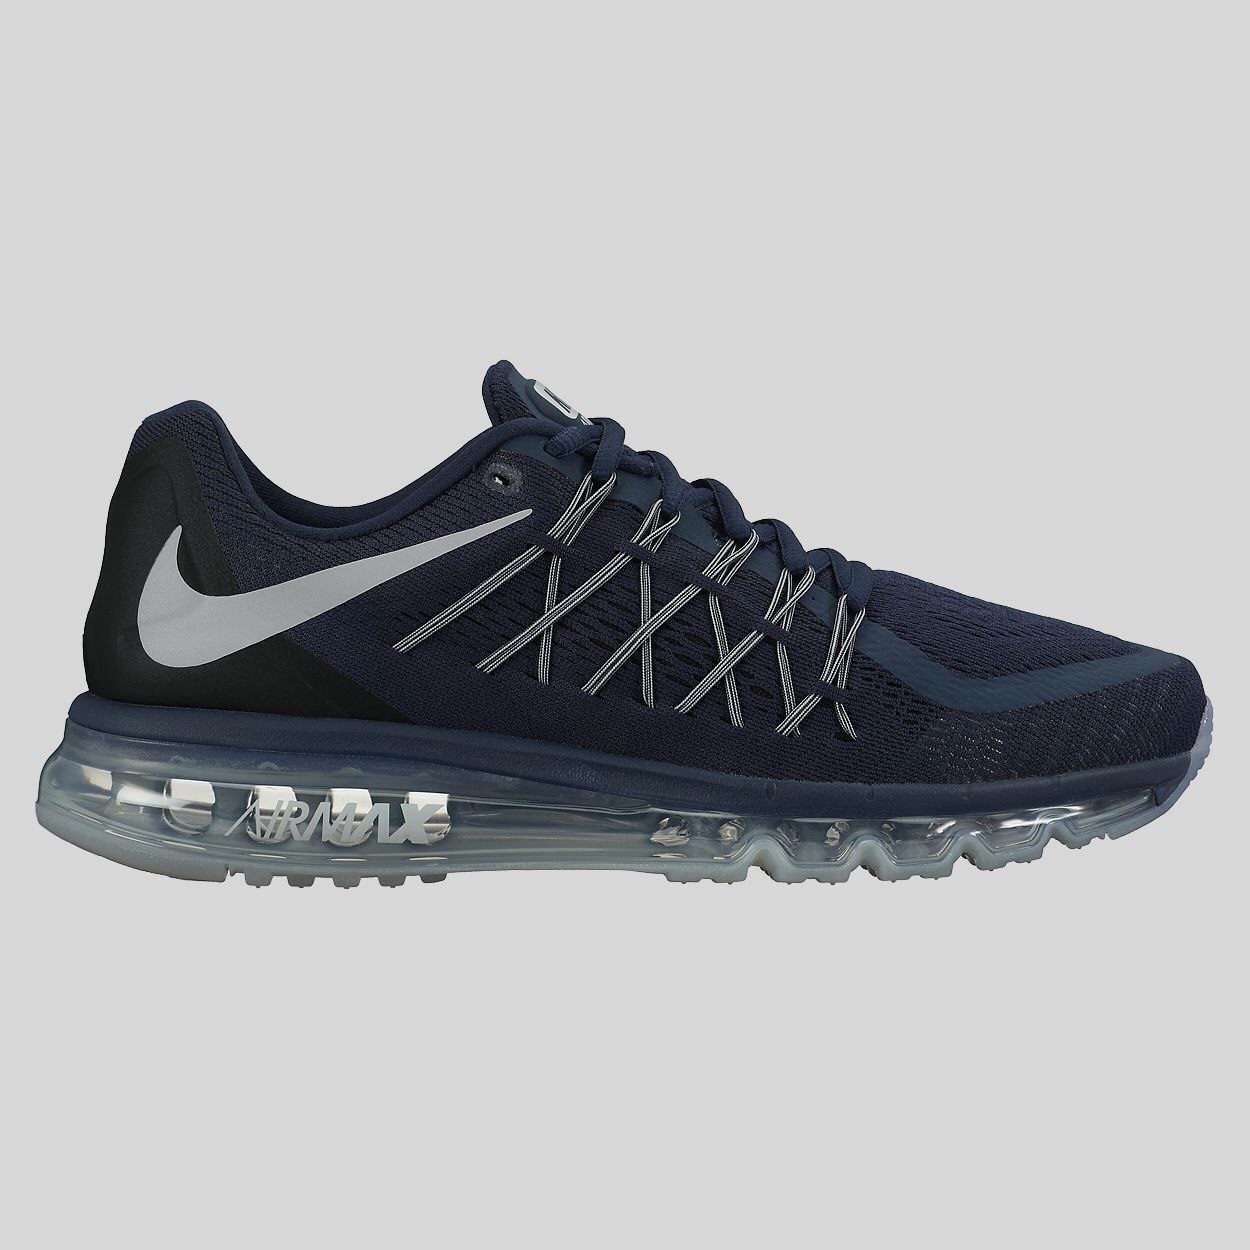 NIB Auth Nike Air Max 2015 Running Shoe 698902-405 Navy Blue Gray MENS Sz 8.5